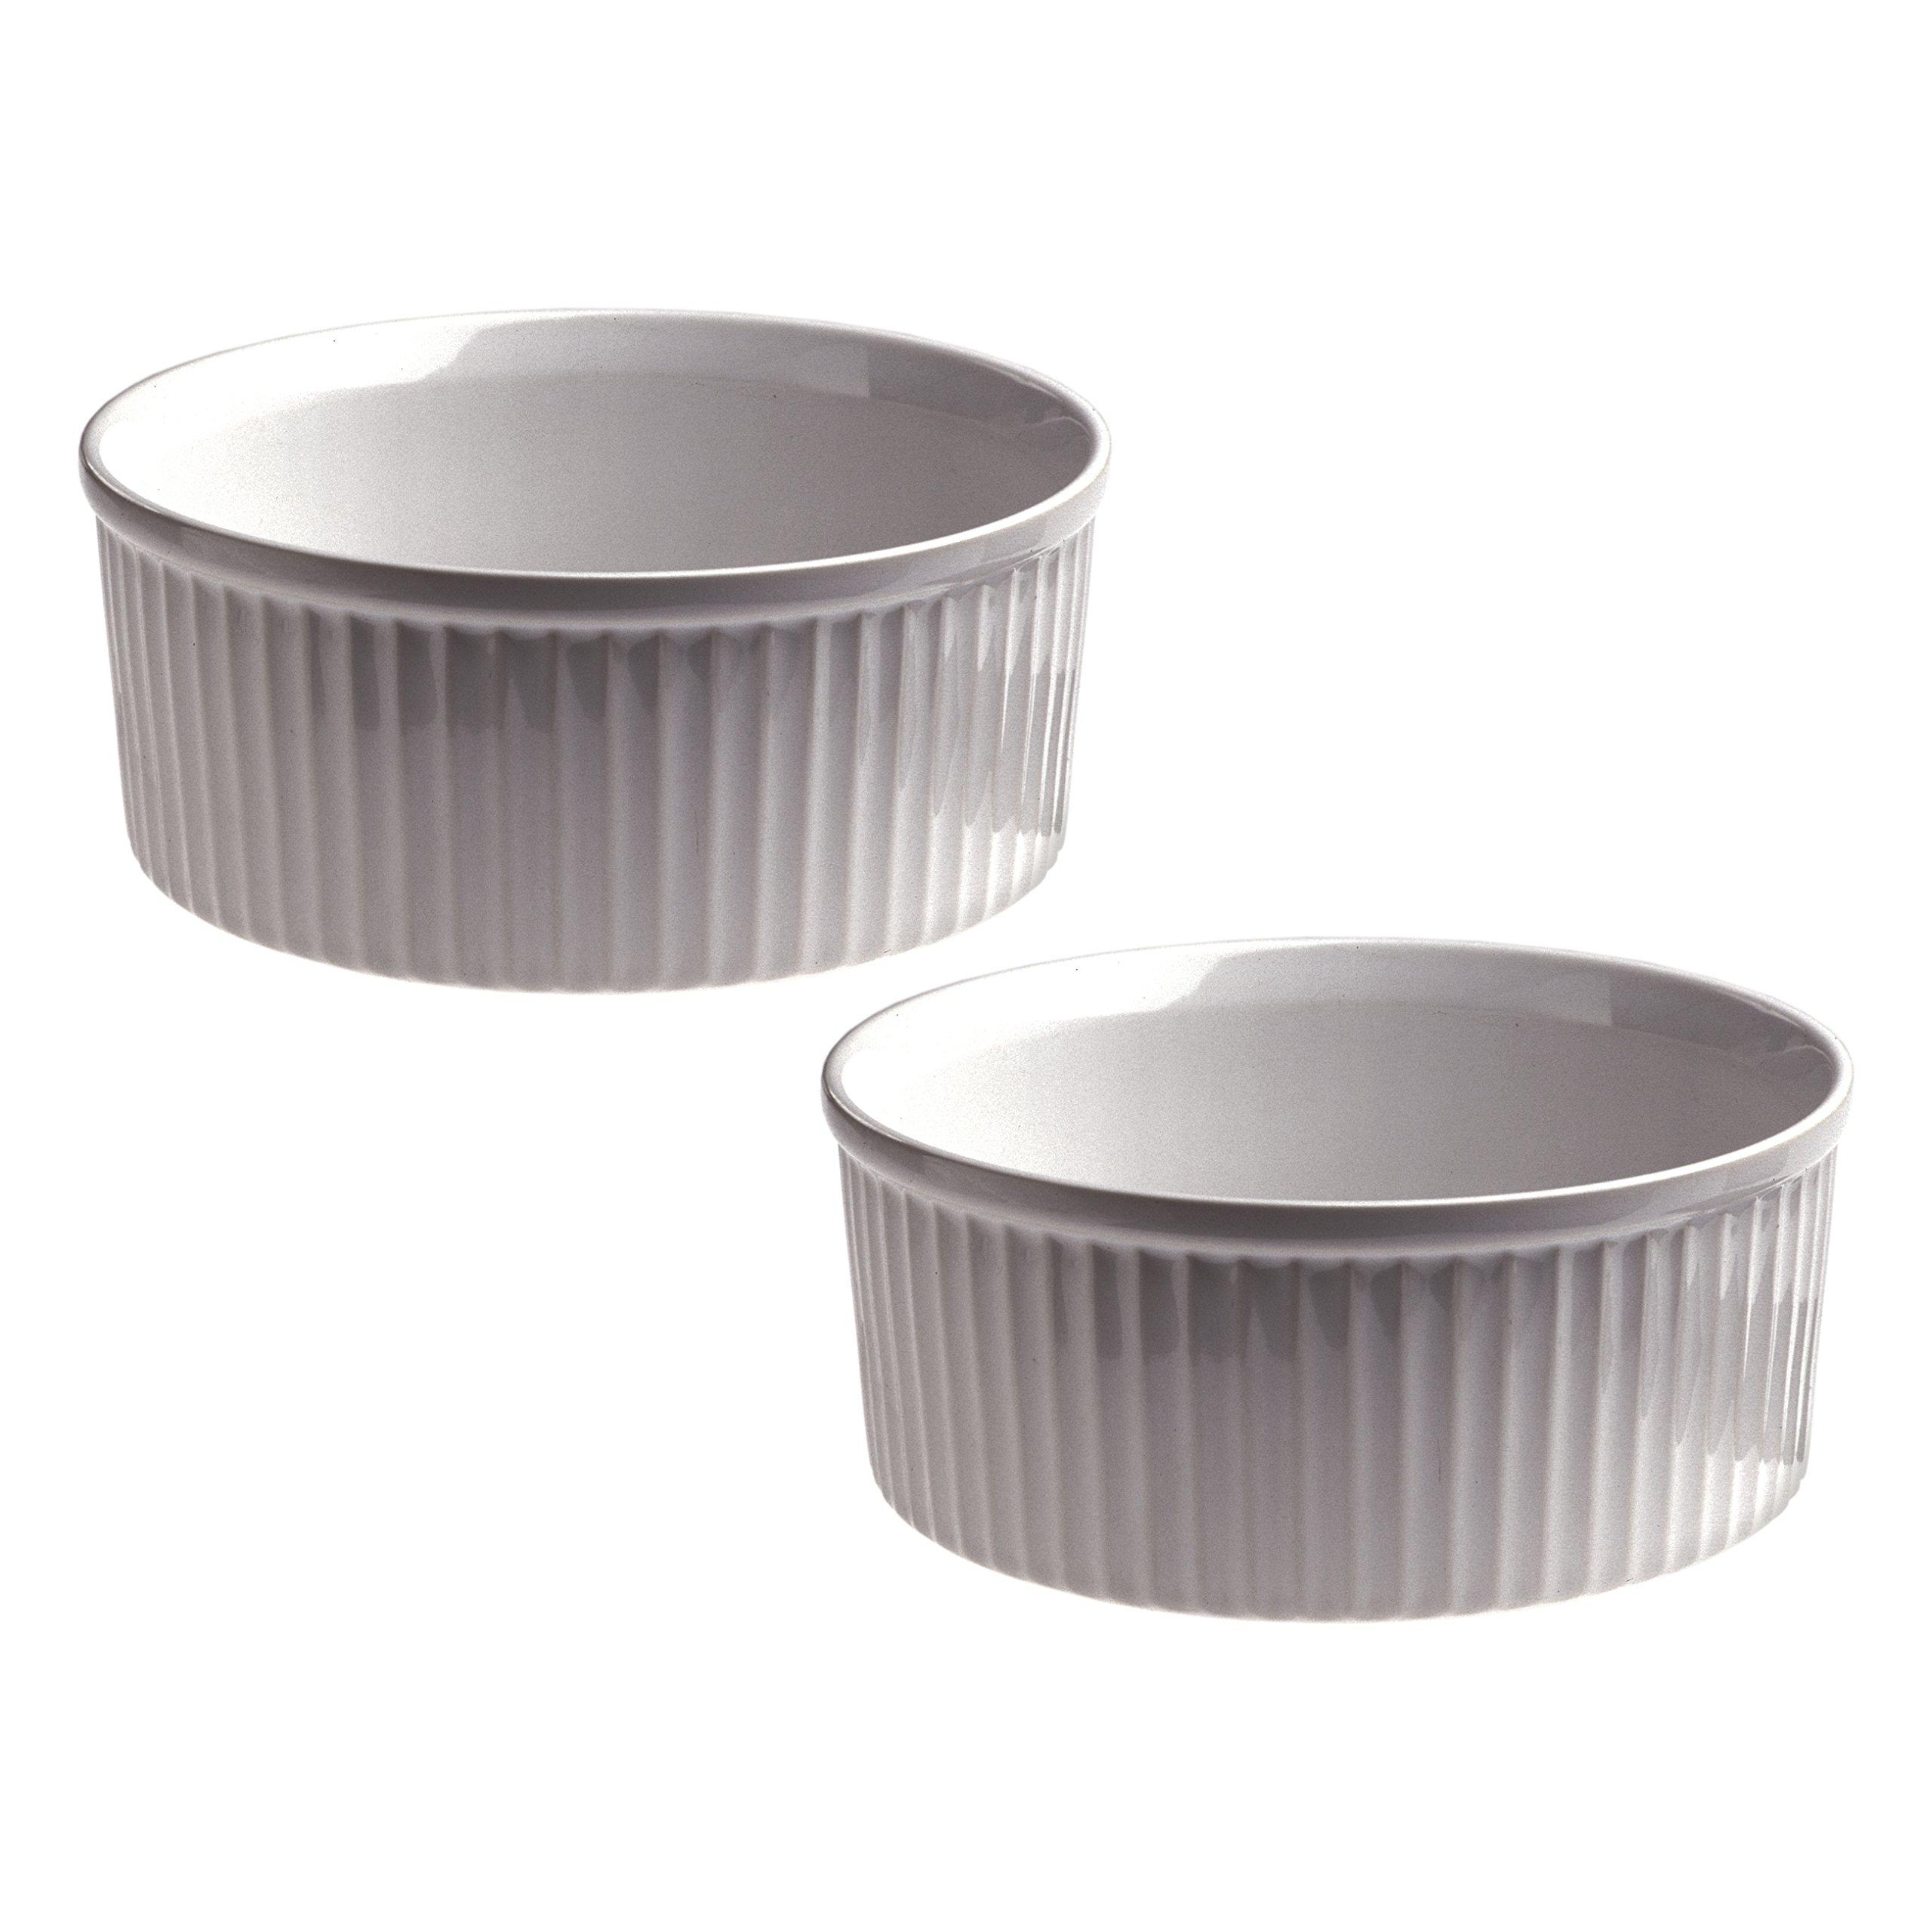 Grands Classique 13 oz. Souffle Dish [Set of 2]